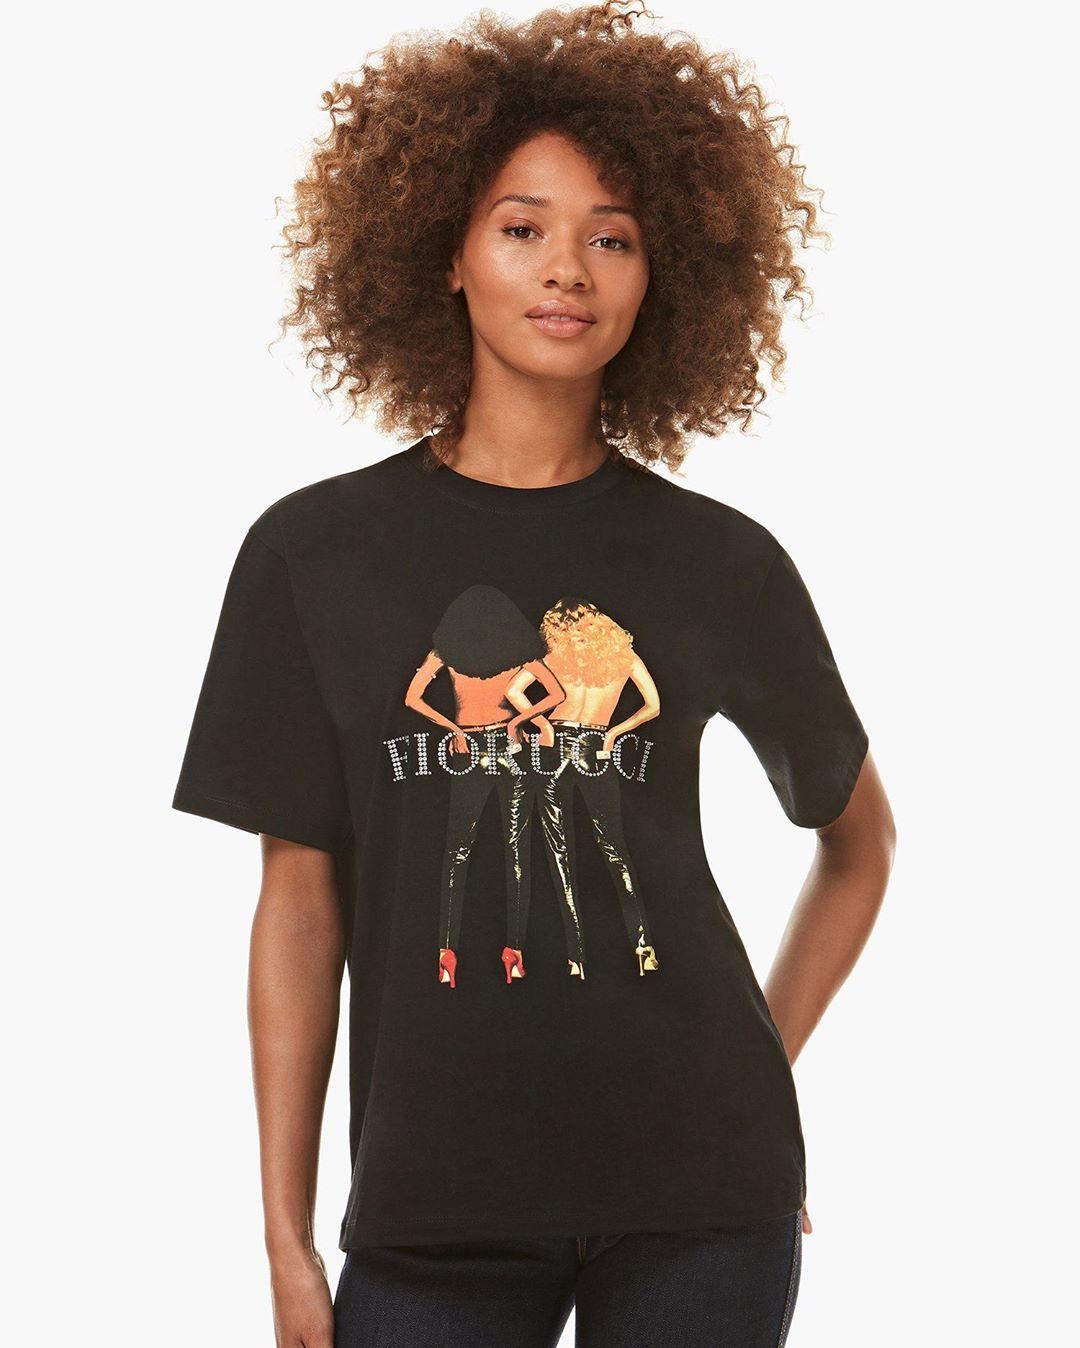 Diamond Vinyl Girls T-shirt Black